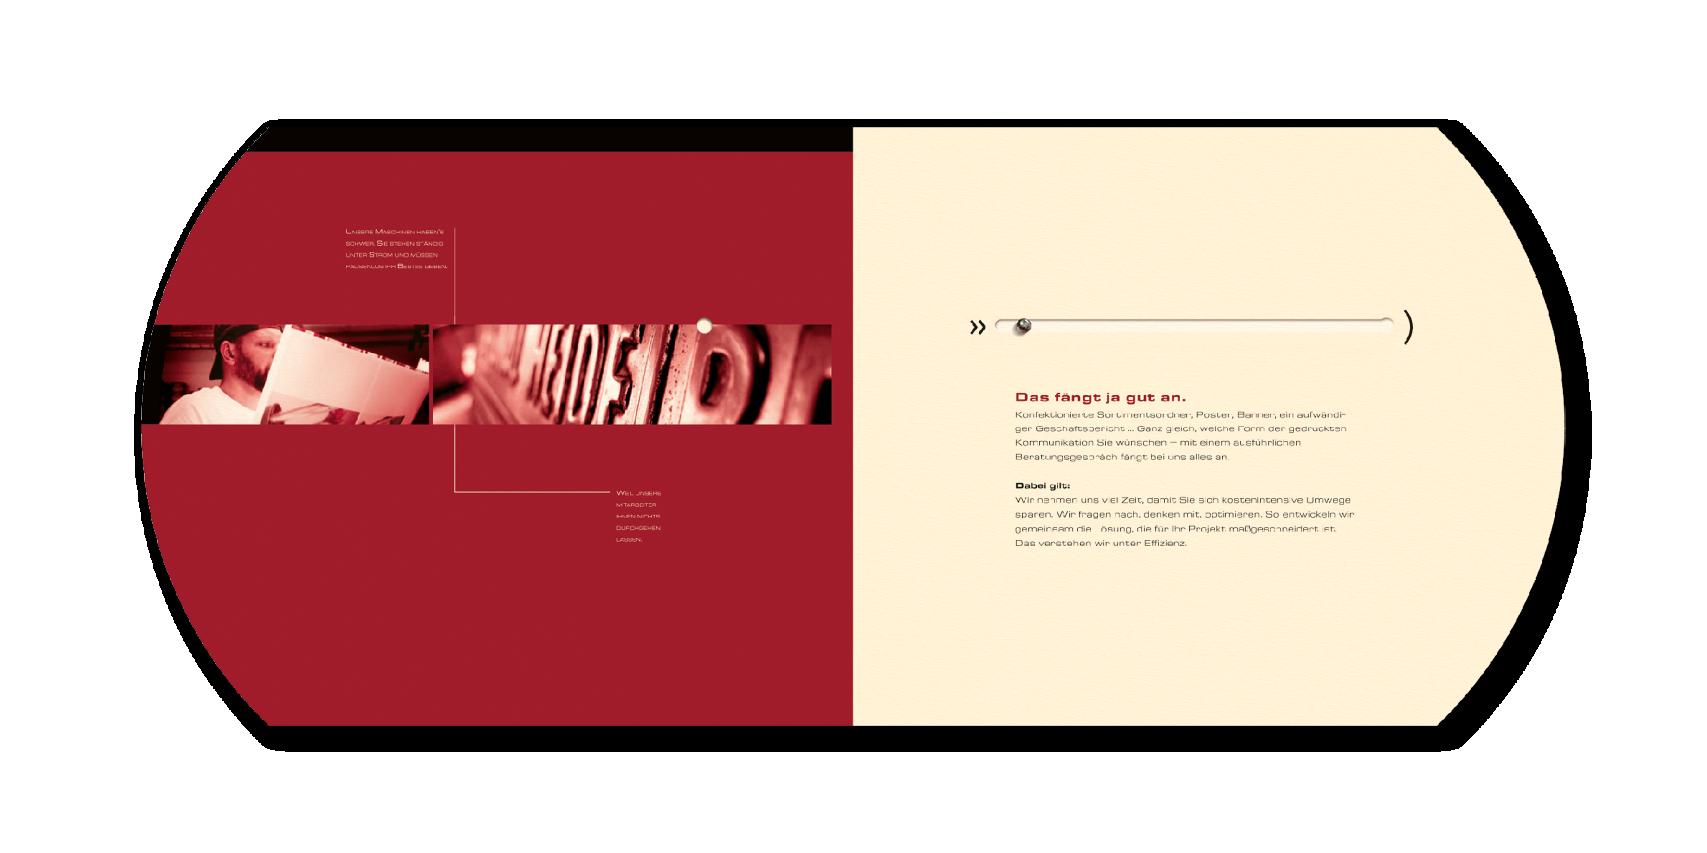 PQS-Imagebroschuere-3